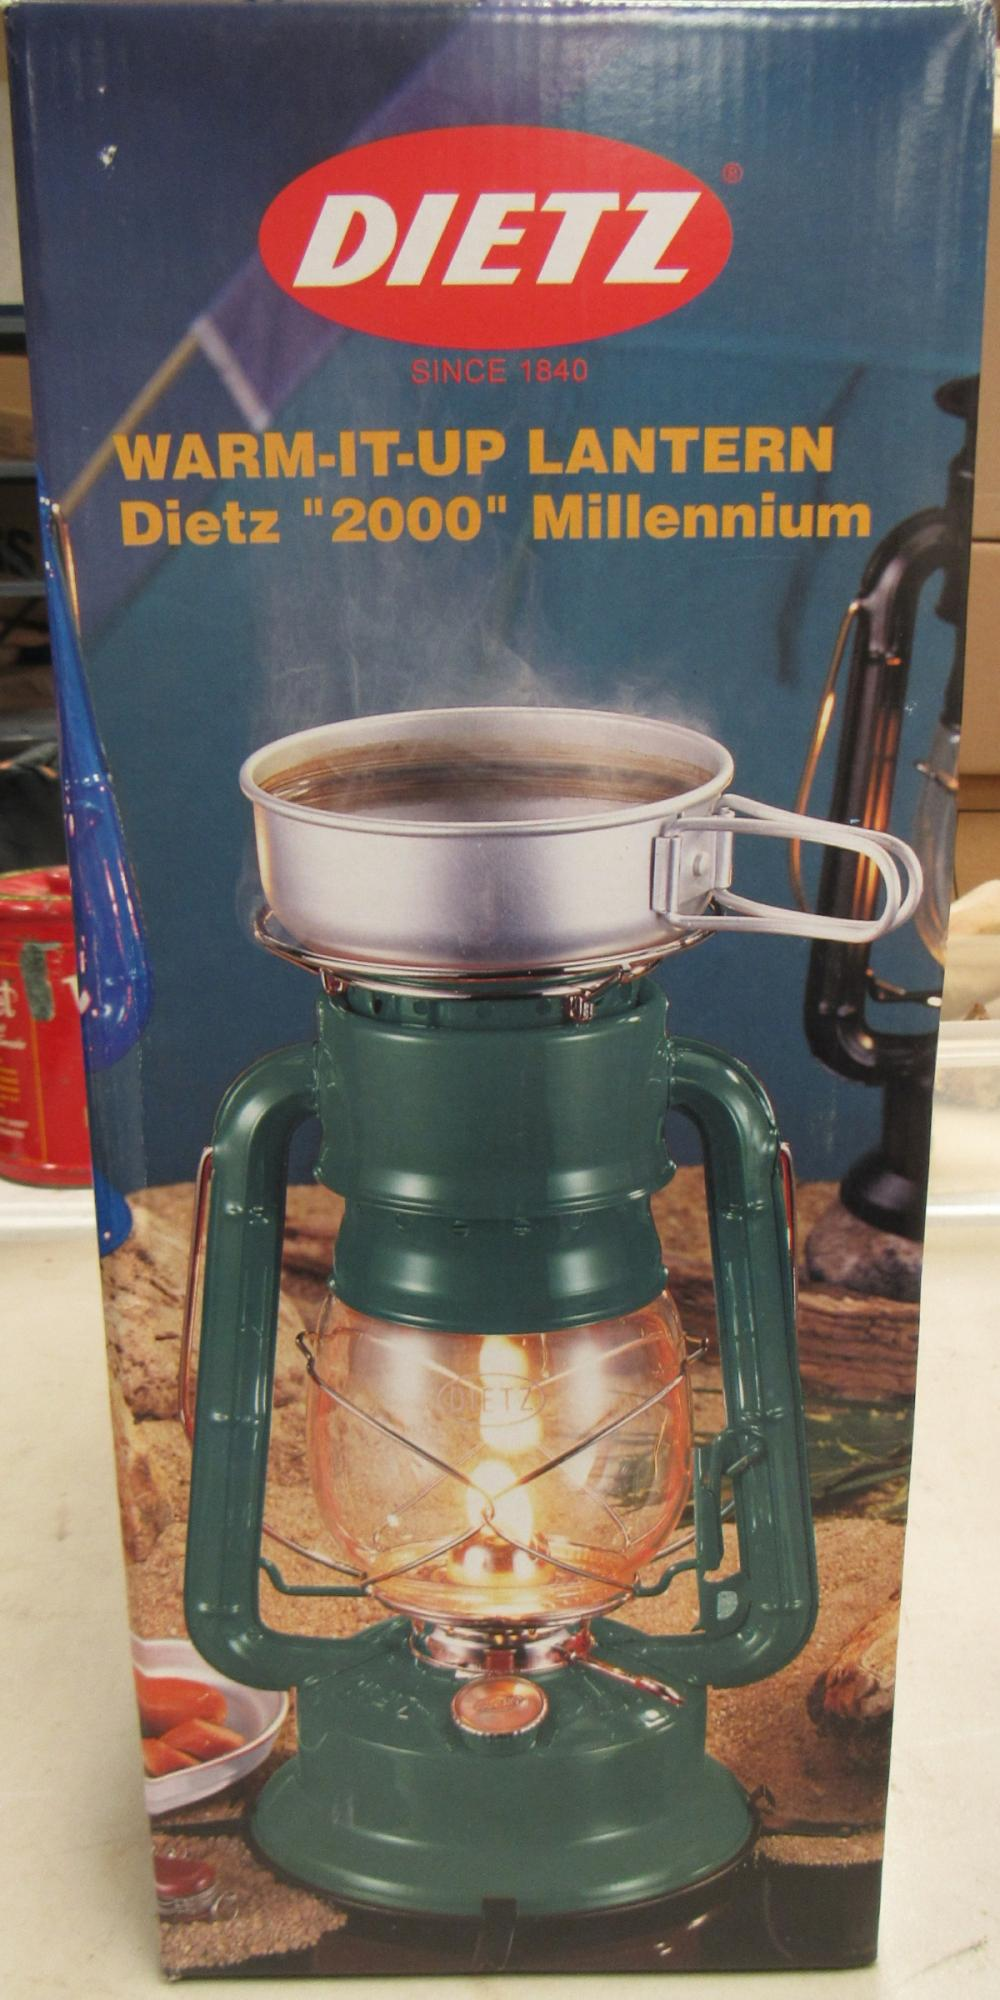 Green Dietz 2000 Millennium Warm It Up Oil Kerosene Cooker Camping Lantern, MIB